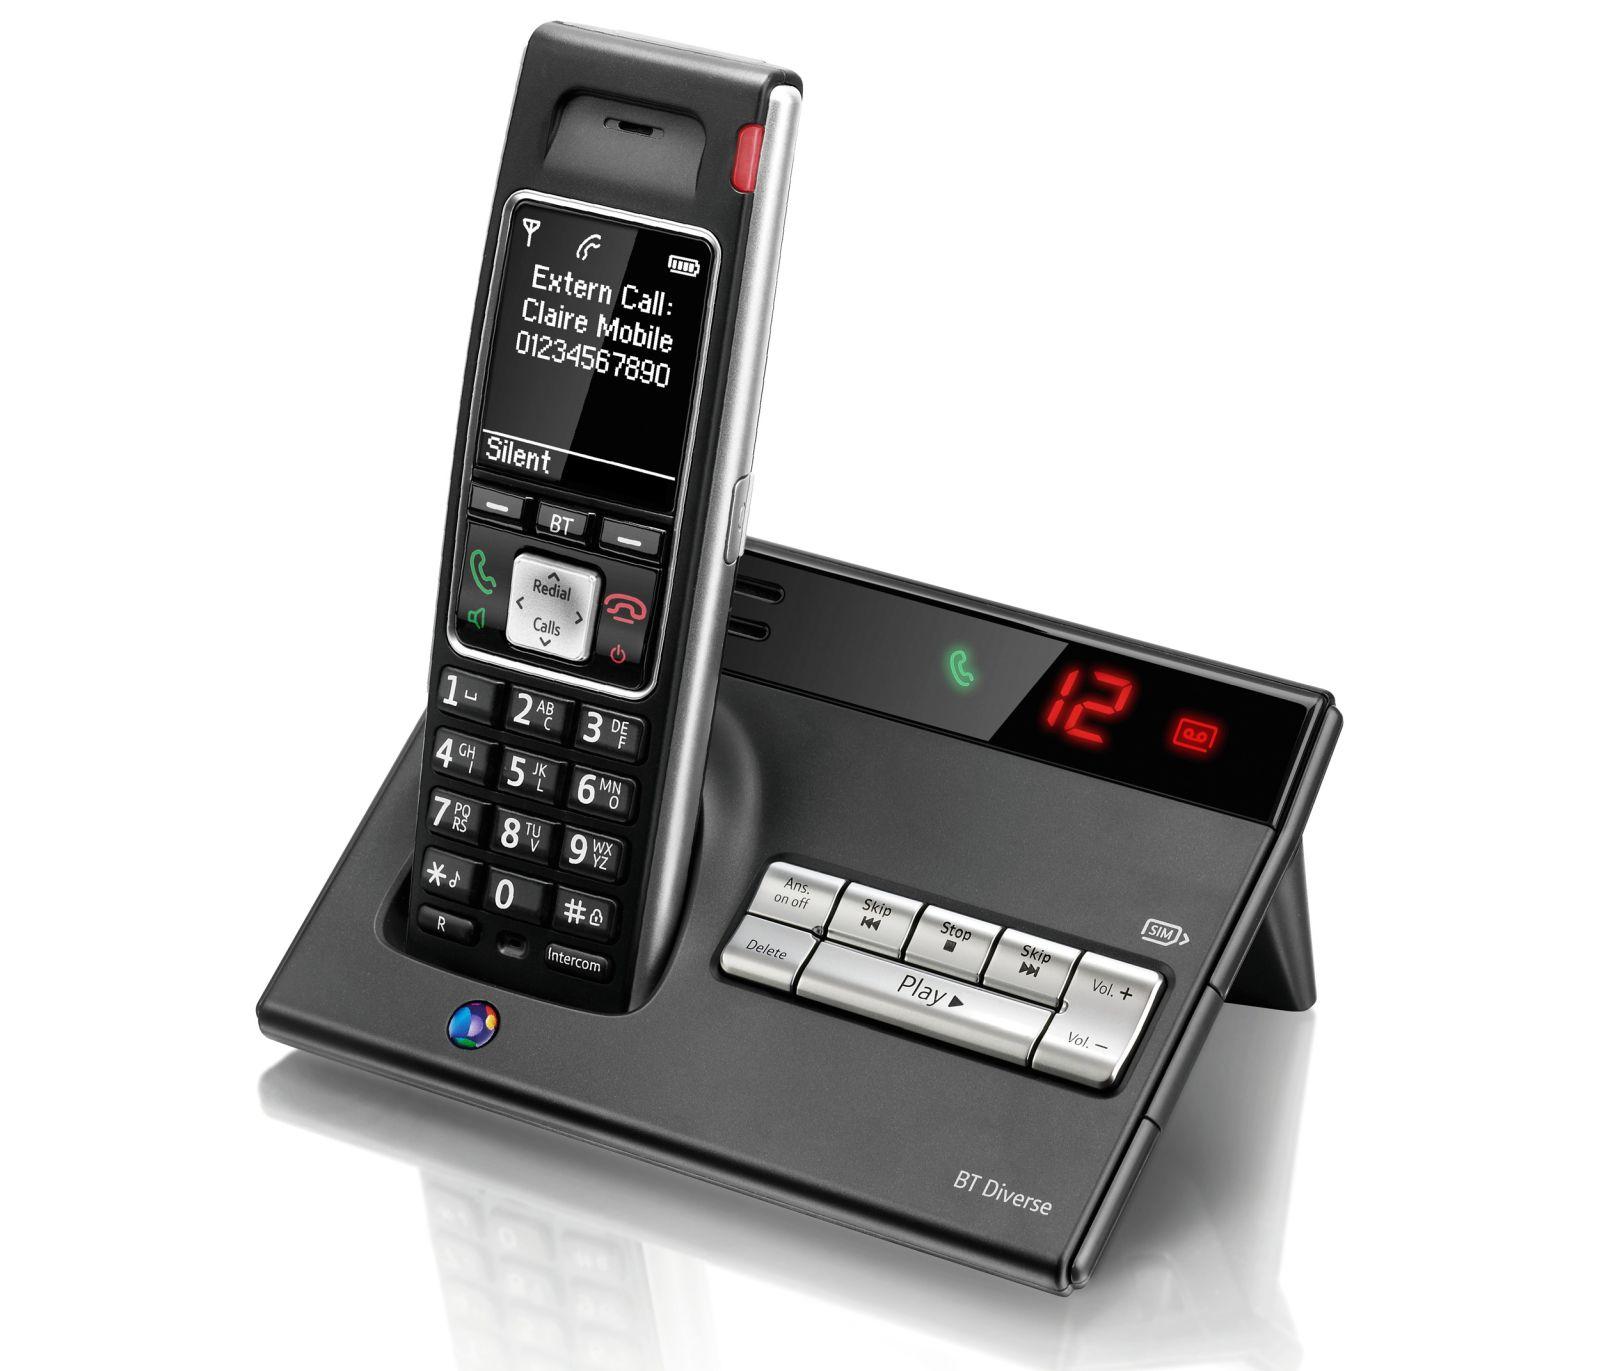 Image of BT Diverse 7450 Plus Cordless Phone, Single Handset